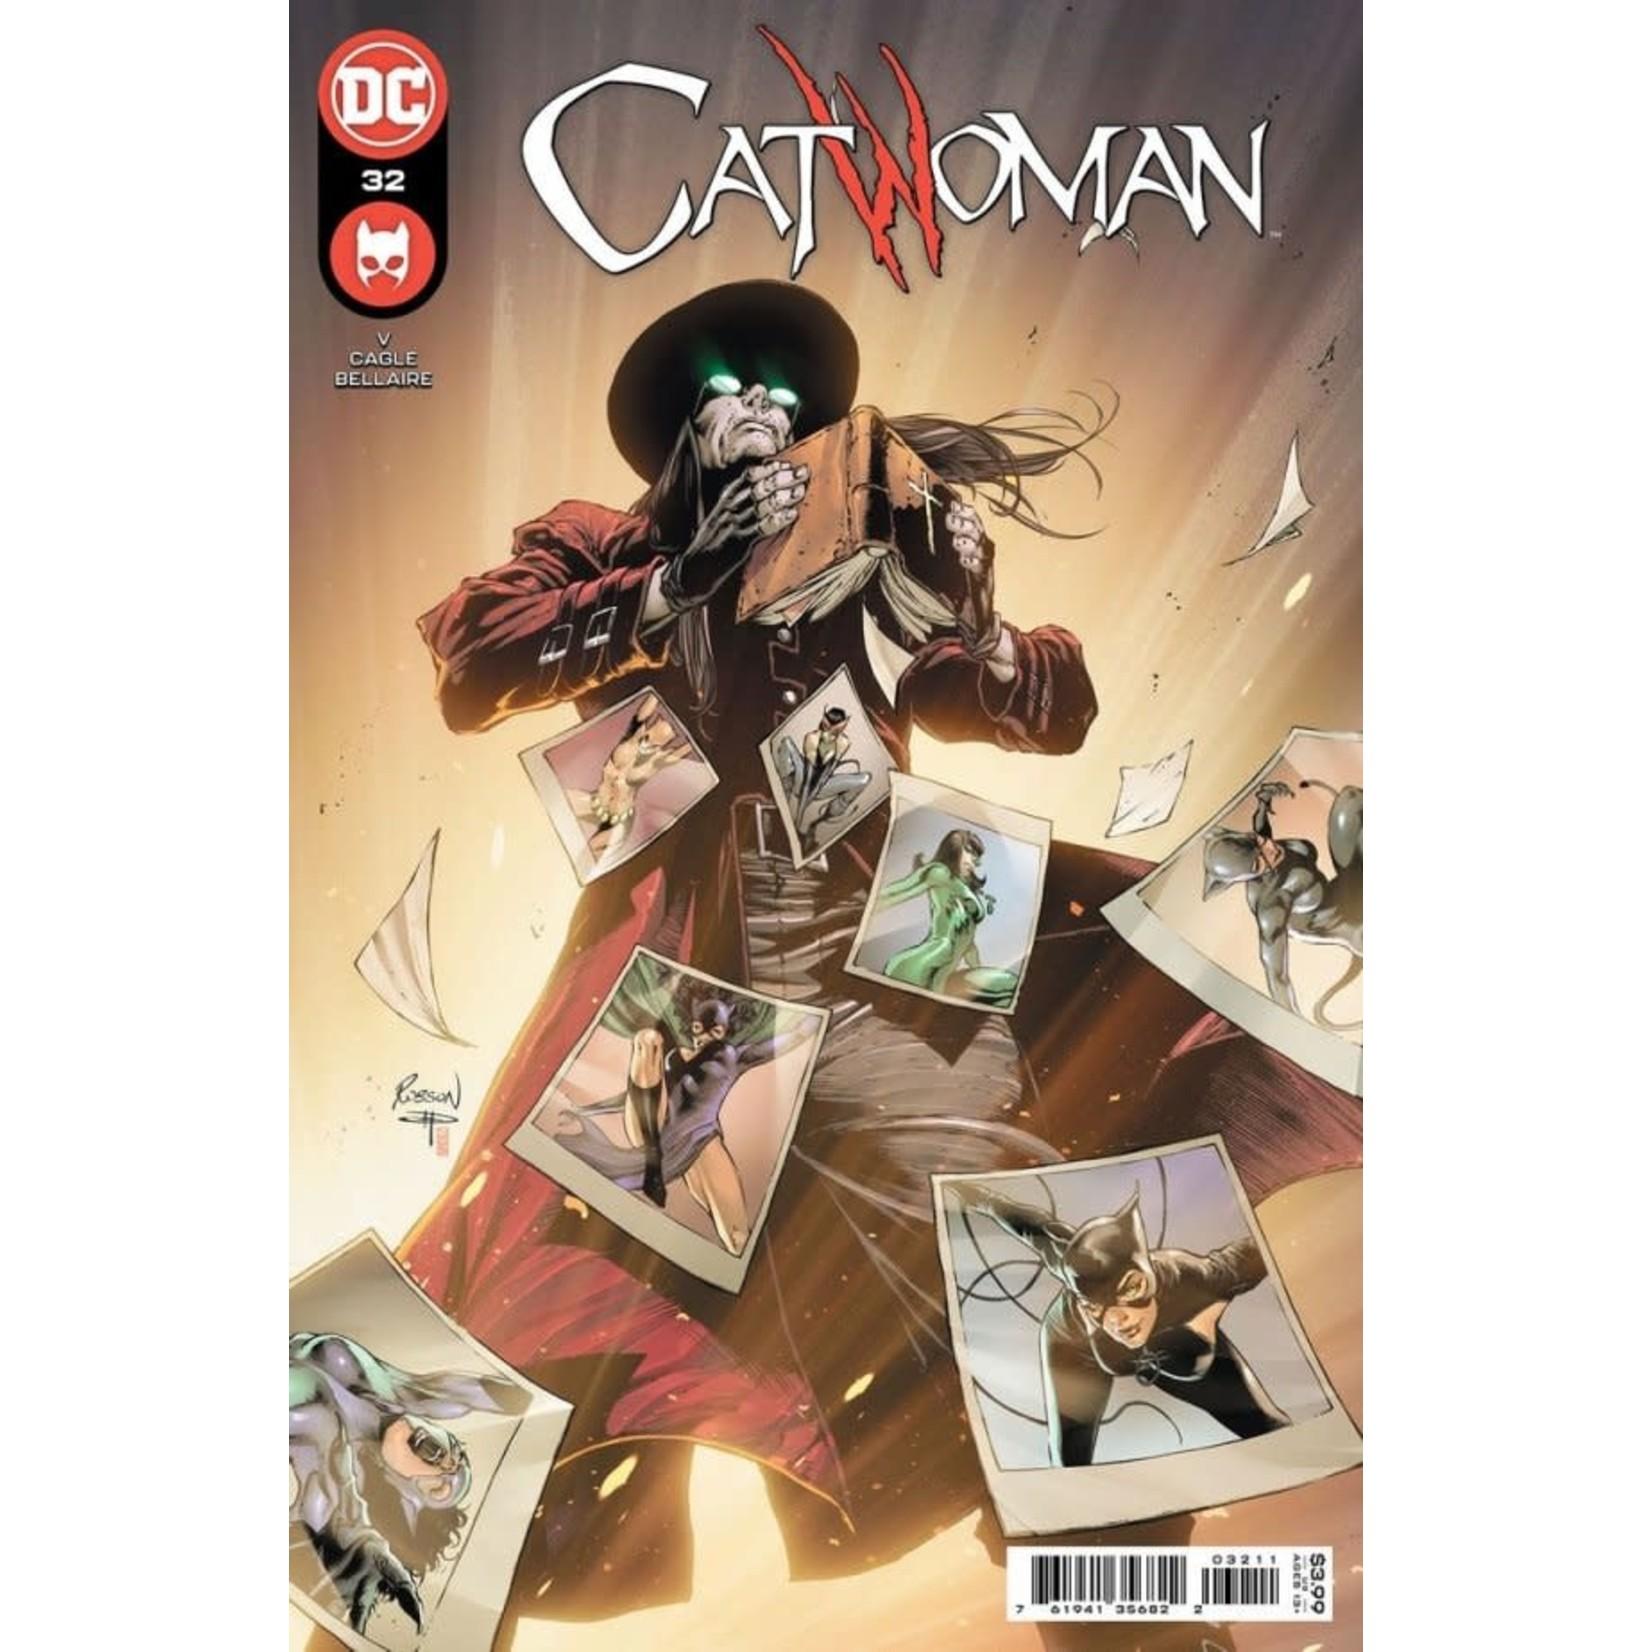 DC Comics CATWOMAN #32 CVR A ROBSON ROCHA